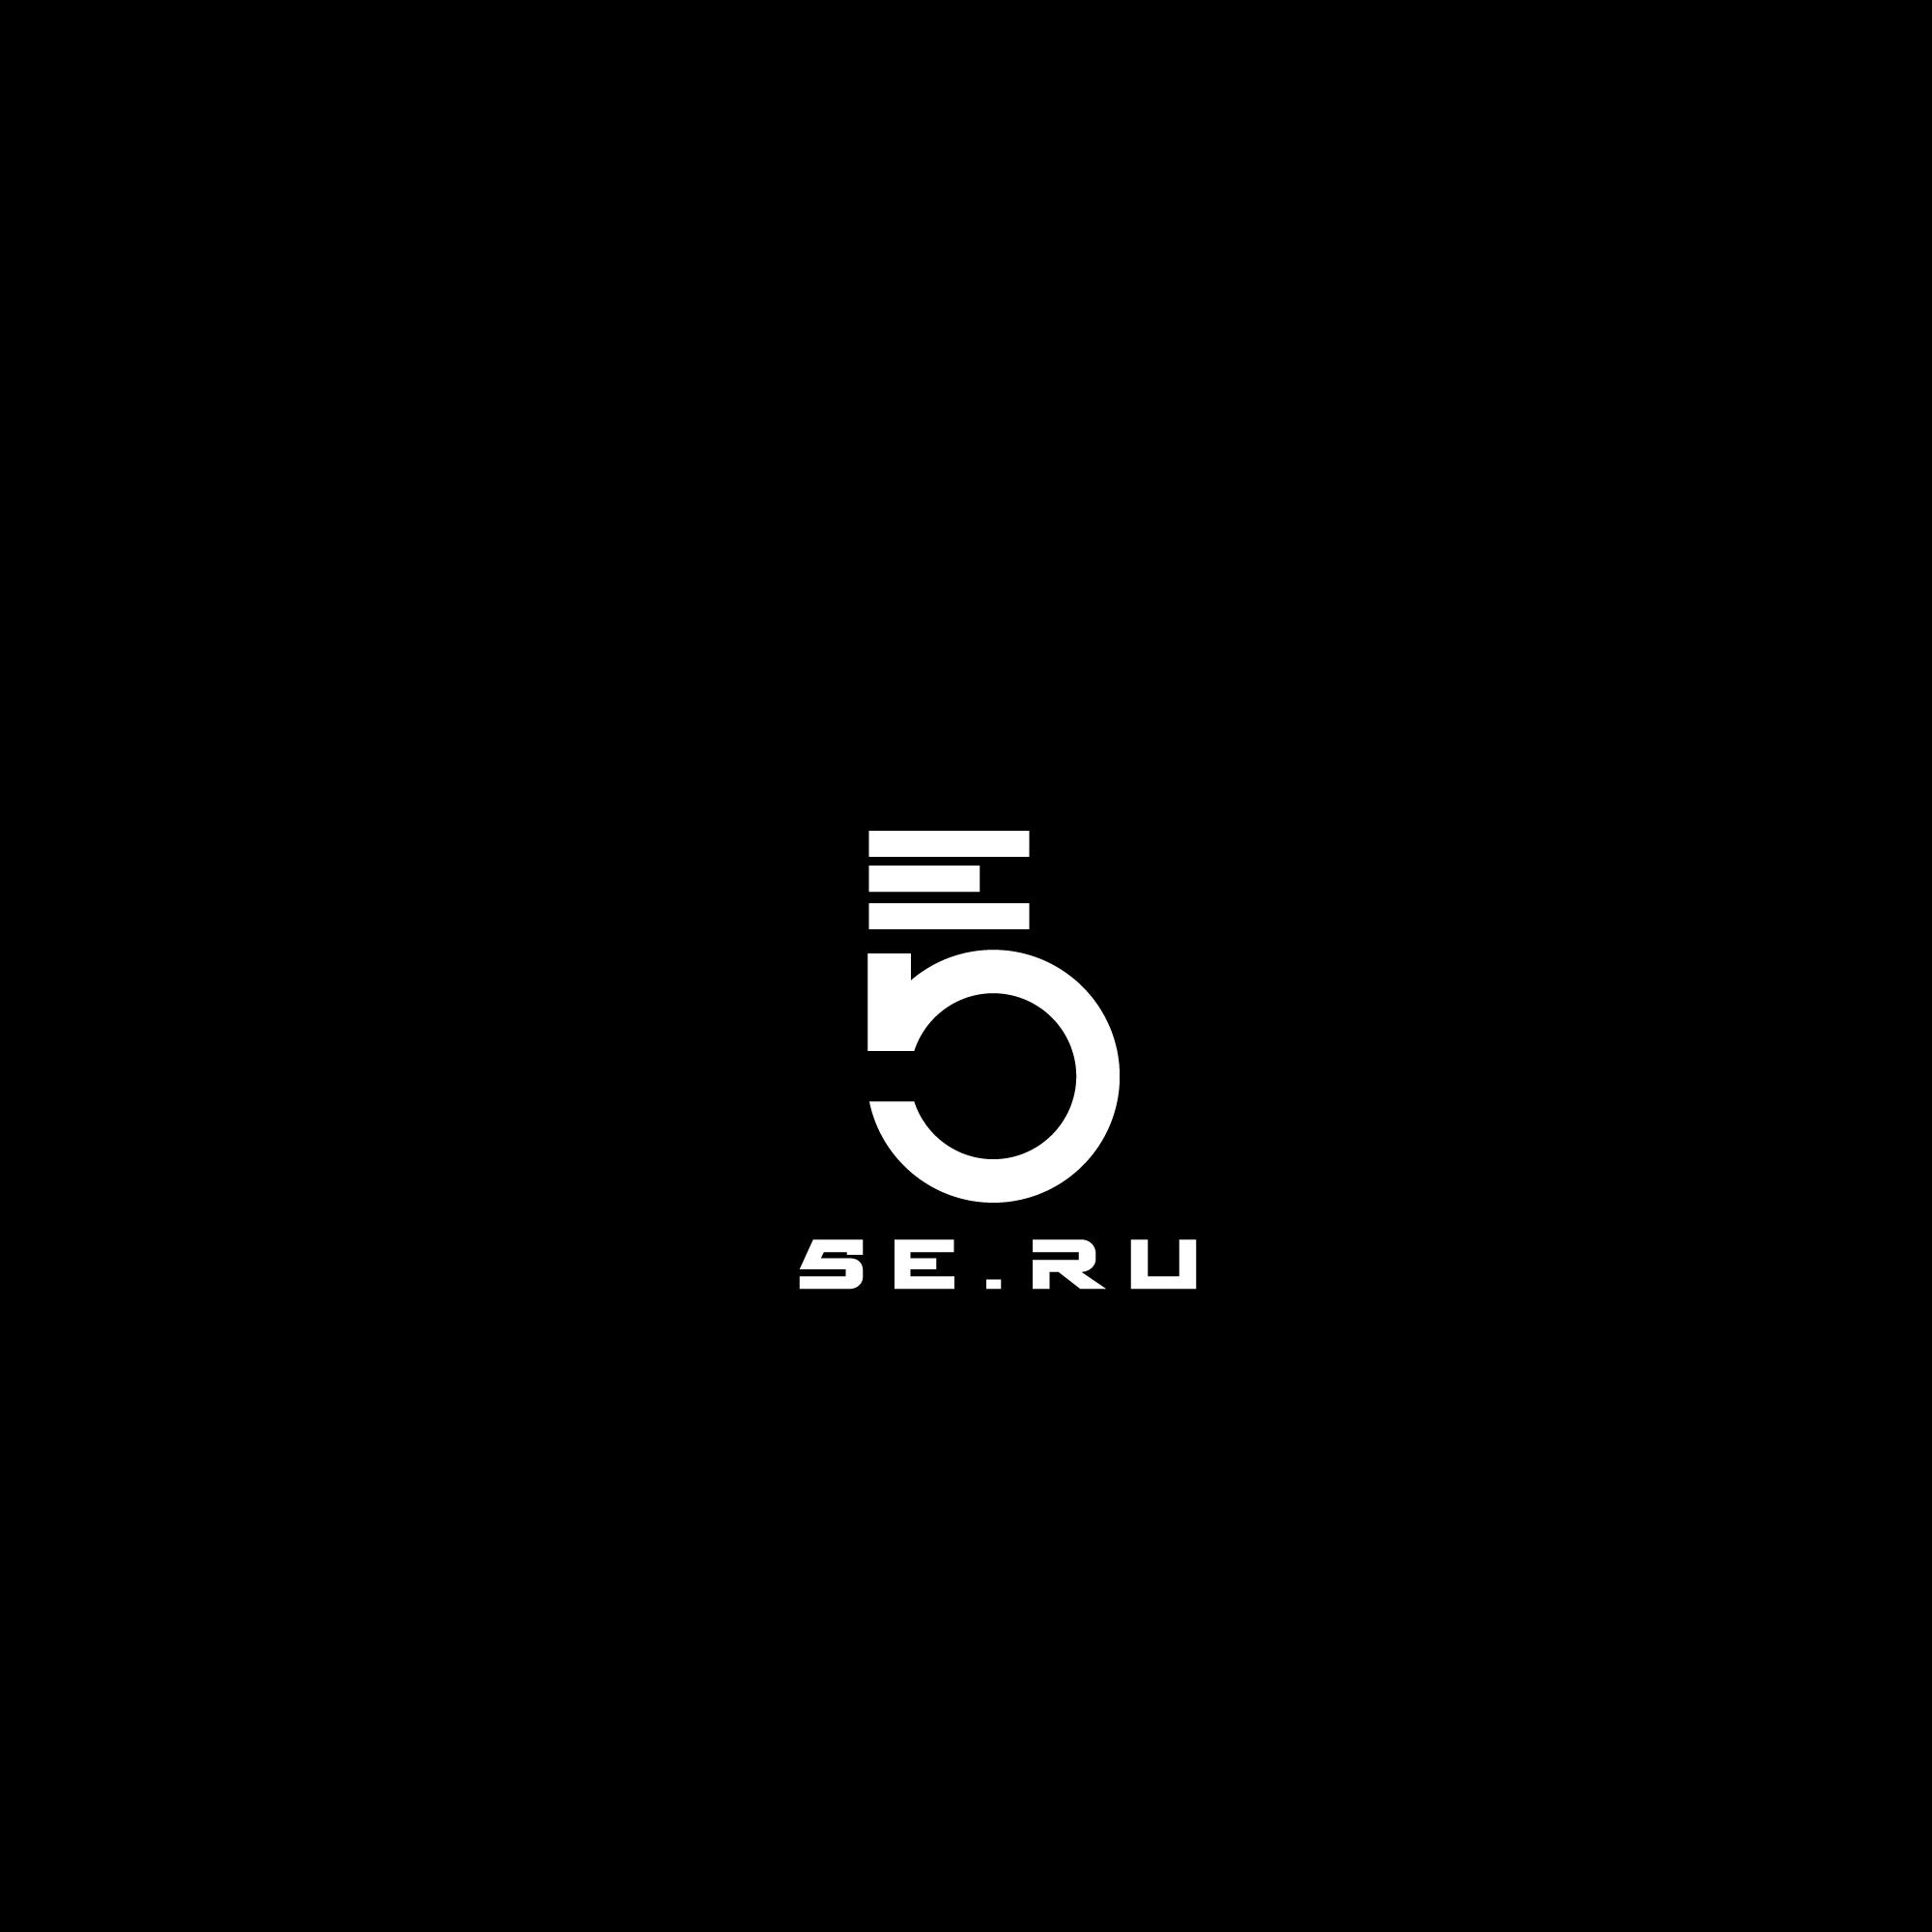 Нарисовать логотип для группы компаний  фото f_0465cdd6a074bbca.jpg